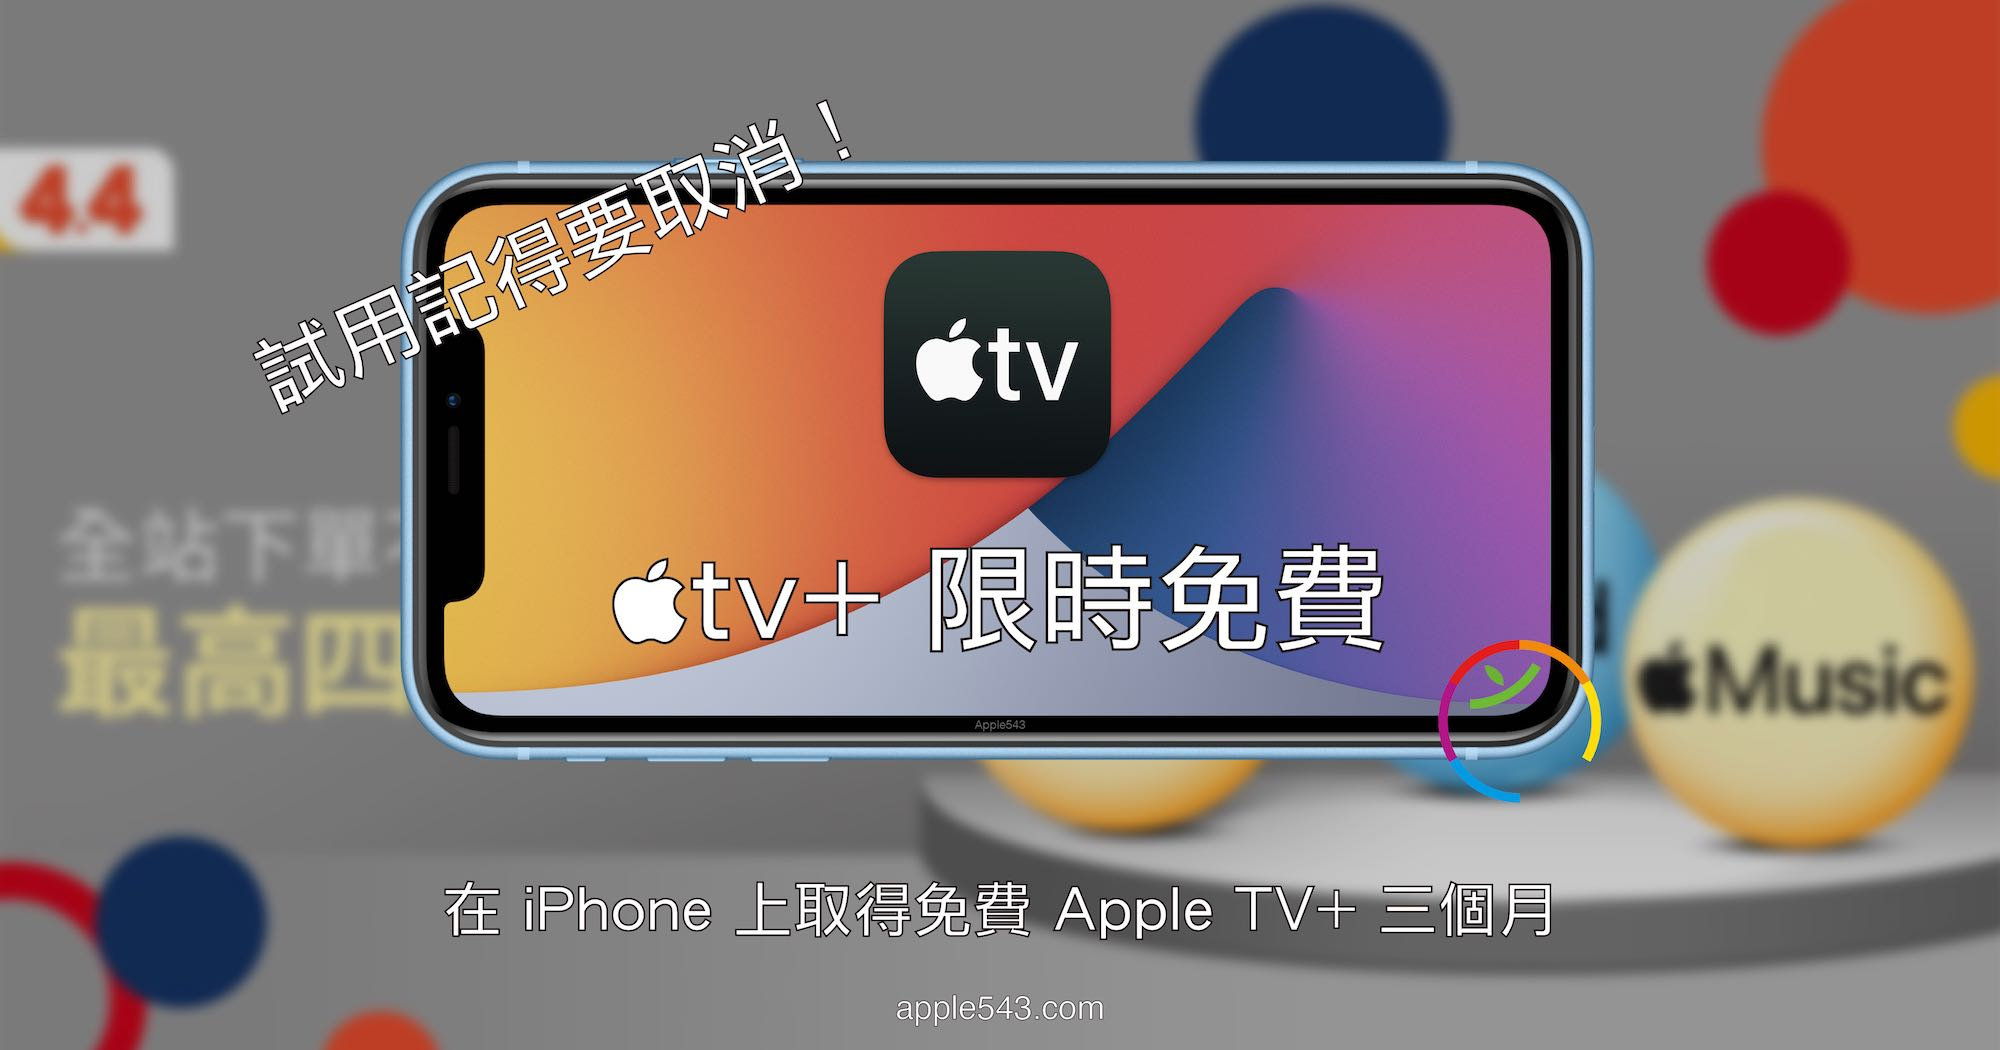 Apple TV+ 免費